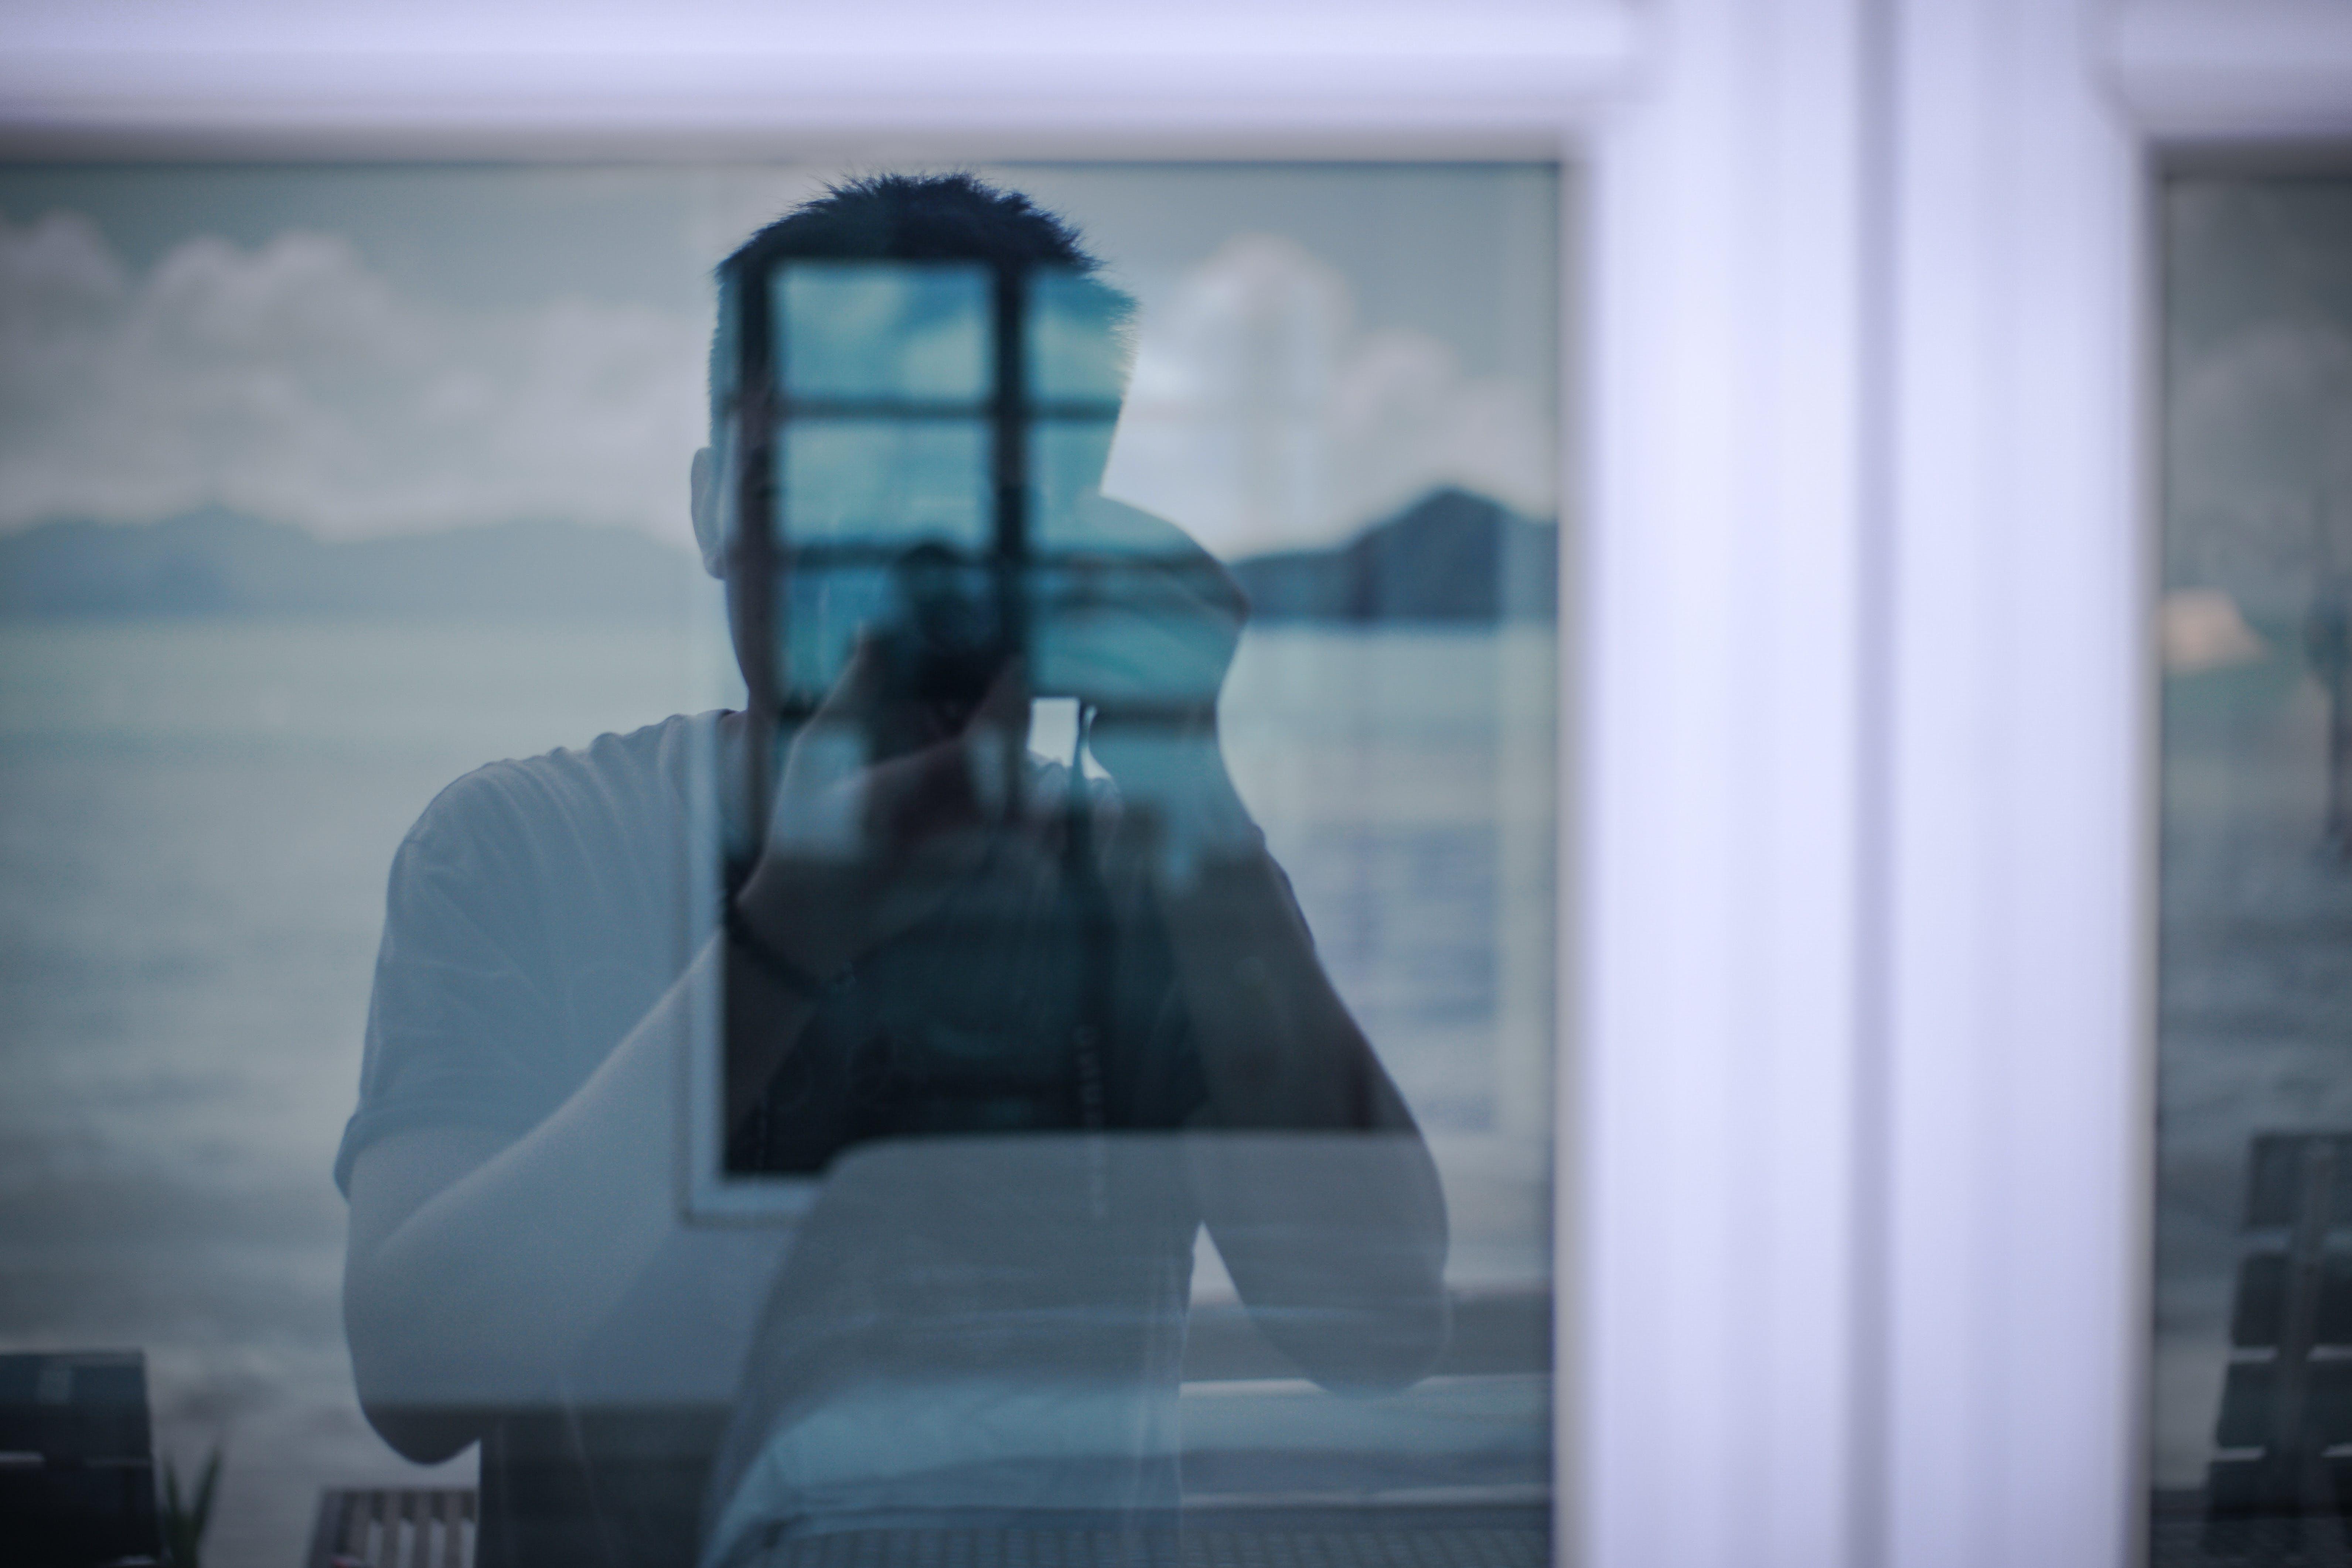 Man Taking Photo of a Windowpane